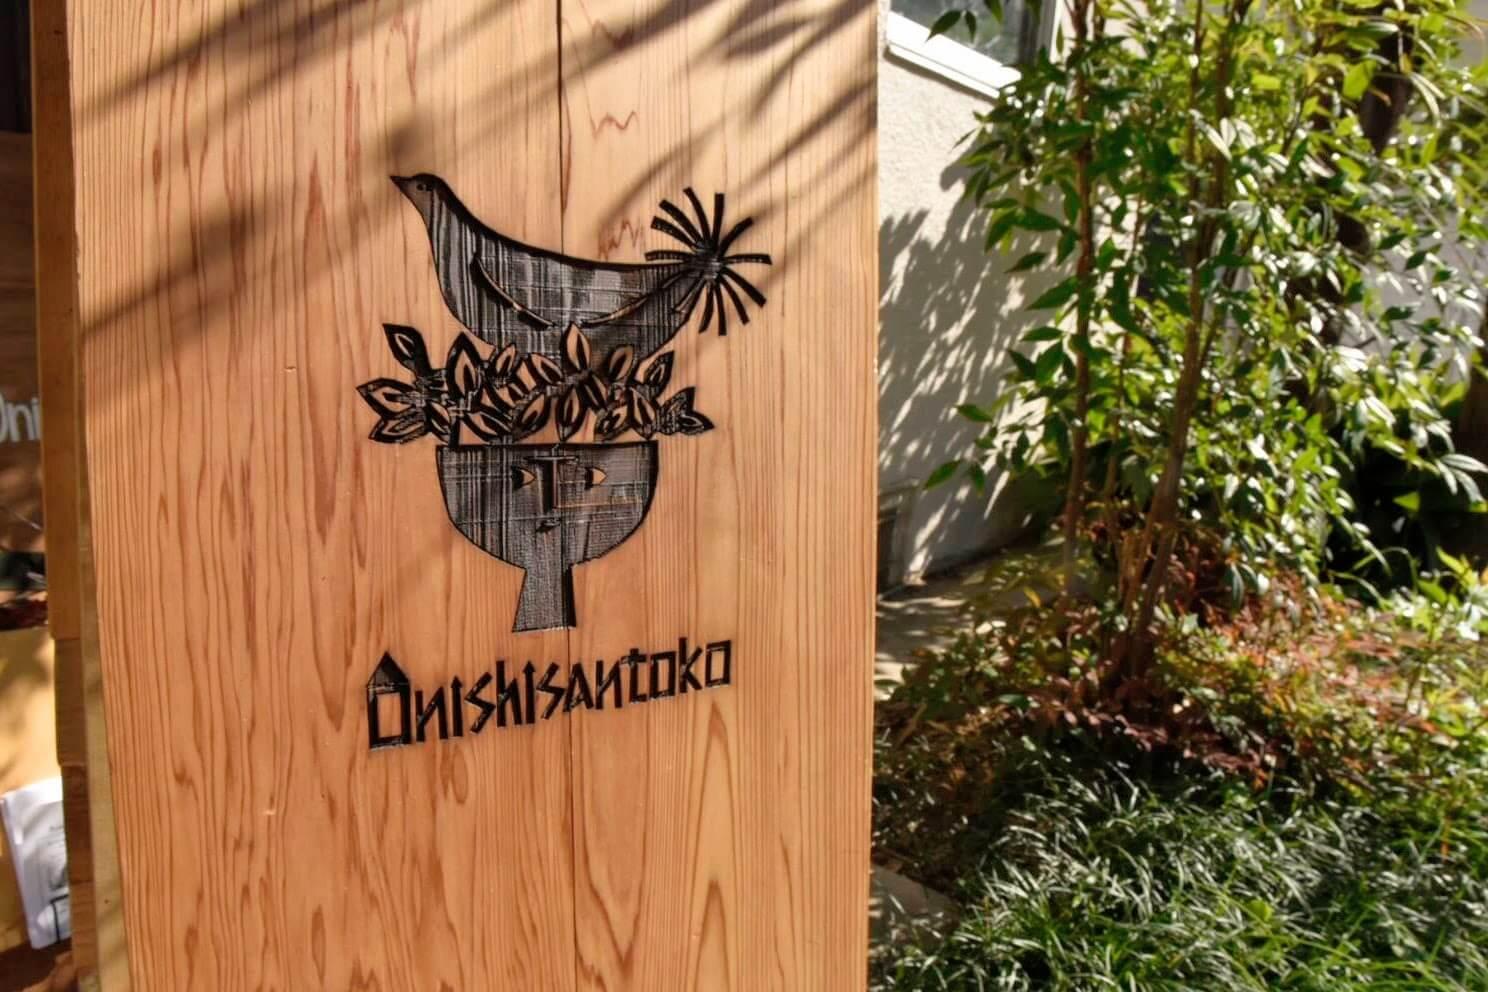 Onishisantokoのデザインロゴ